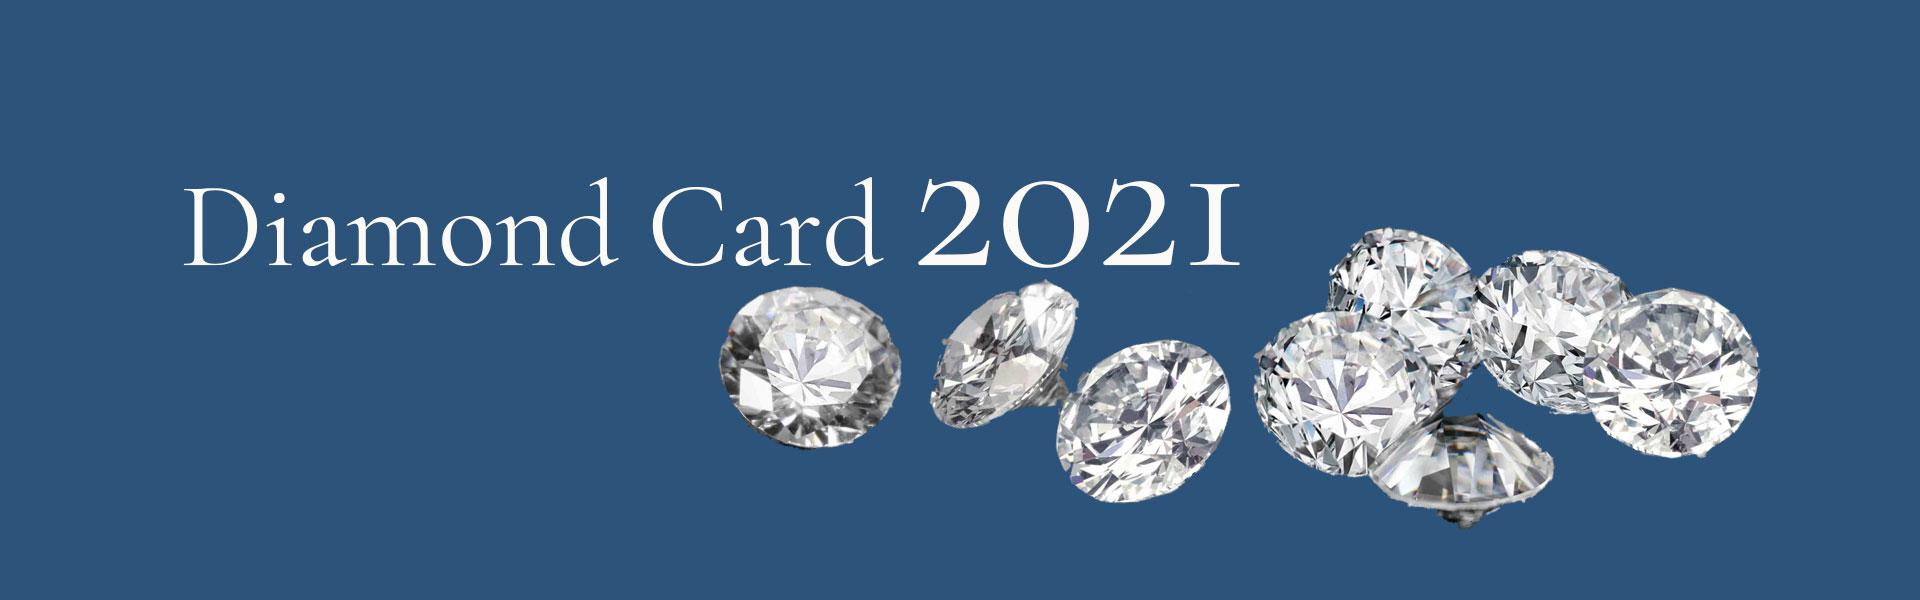 Segais Diamond Card 2021 Salon Discounts Wantage and Didcot